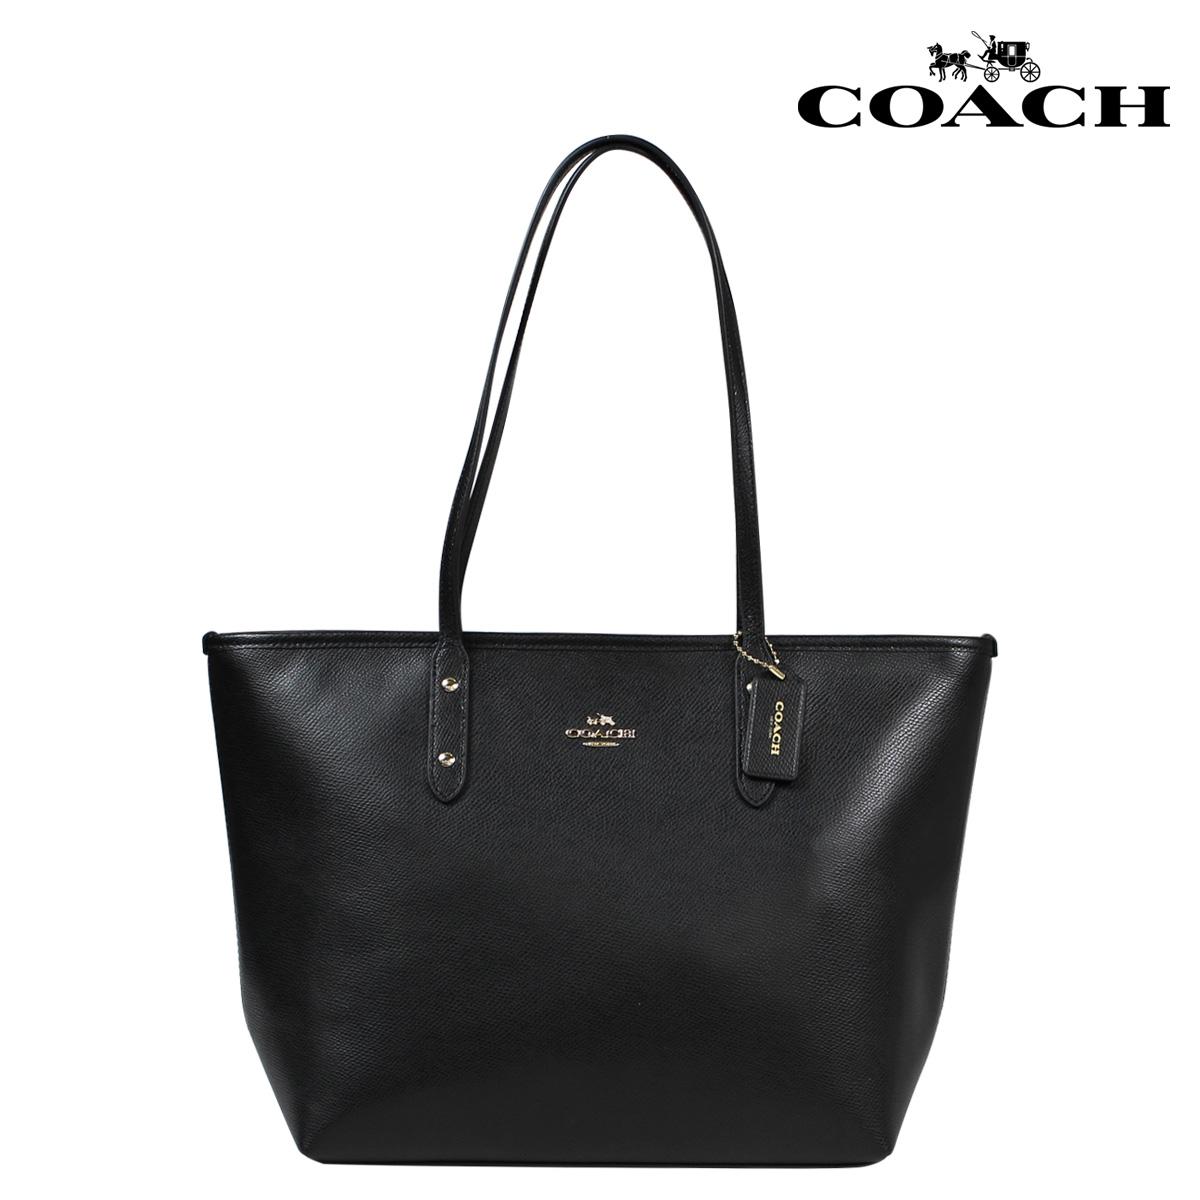 2167ecb77842 Sugar Online Shop  COACH coach bag tote bag F36875 black women s ...